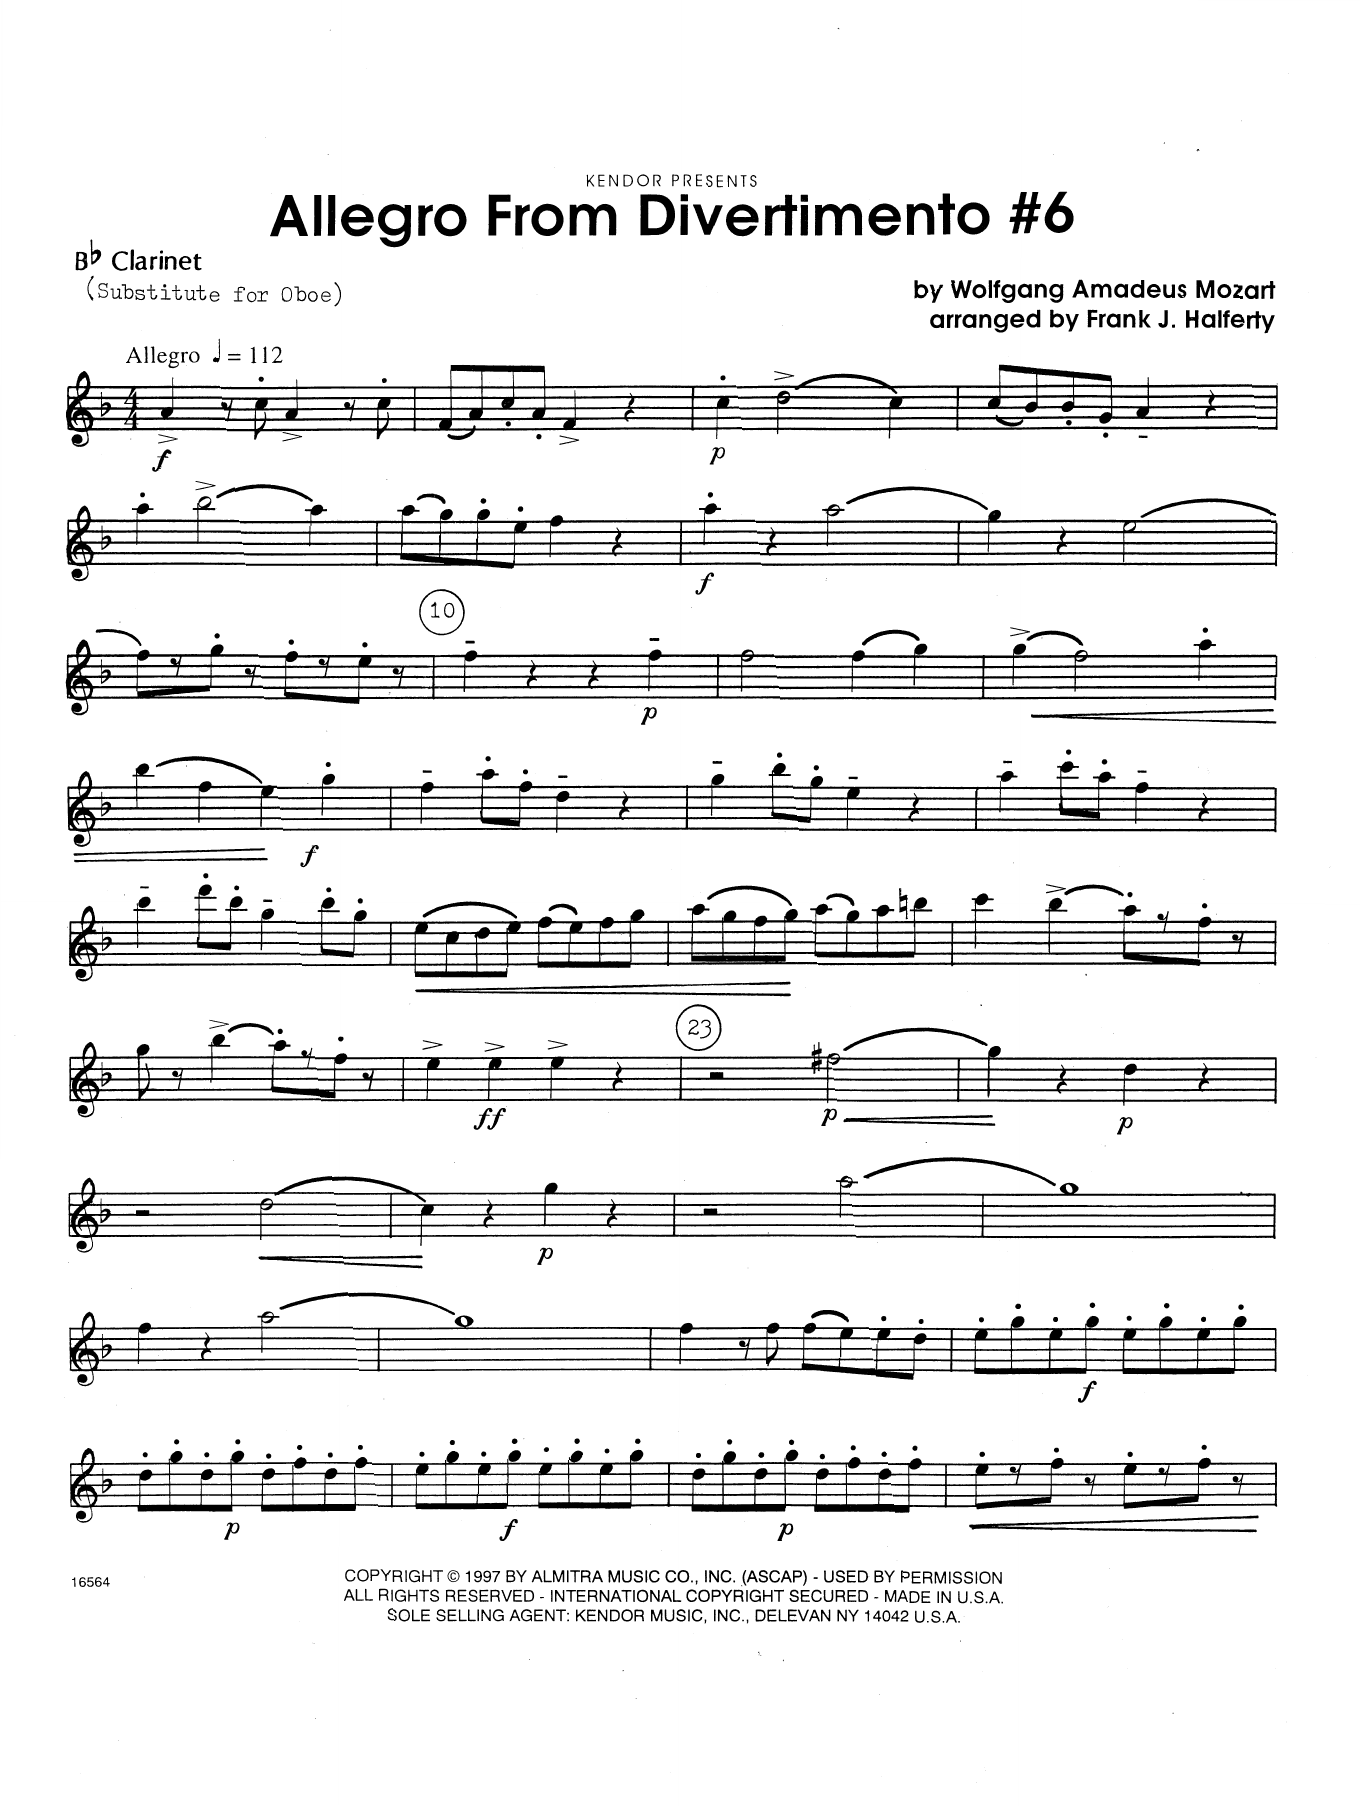 Allegro From Divertimento #6 (arr. Frank Halferty) - Bb Clarinet Sheet Music